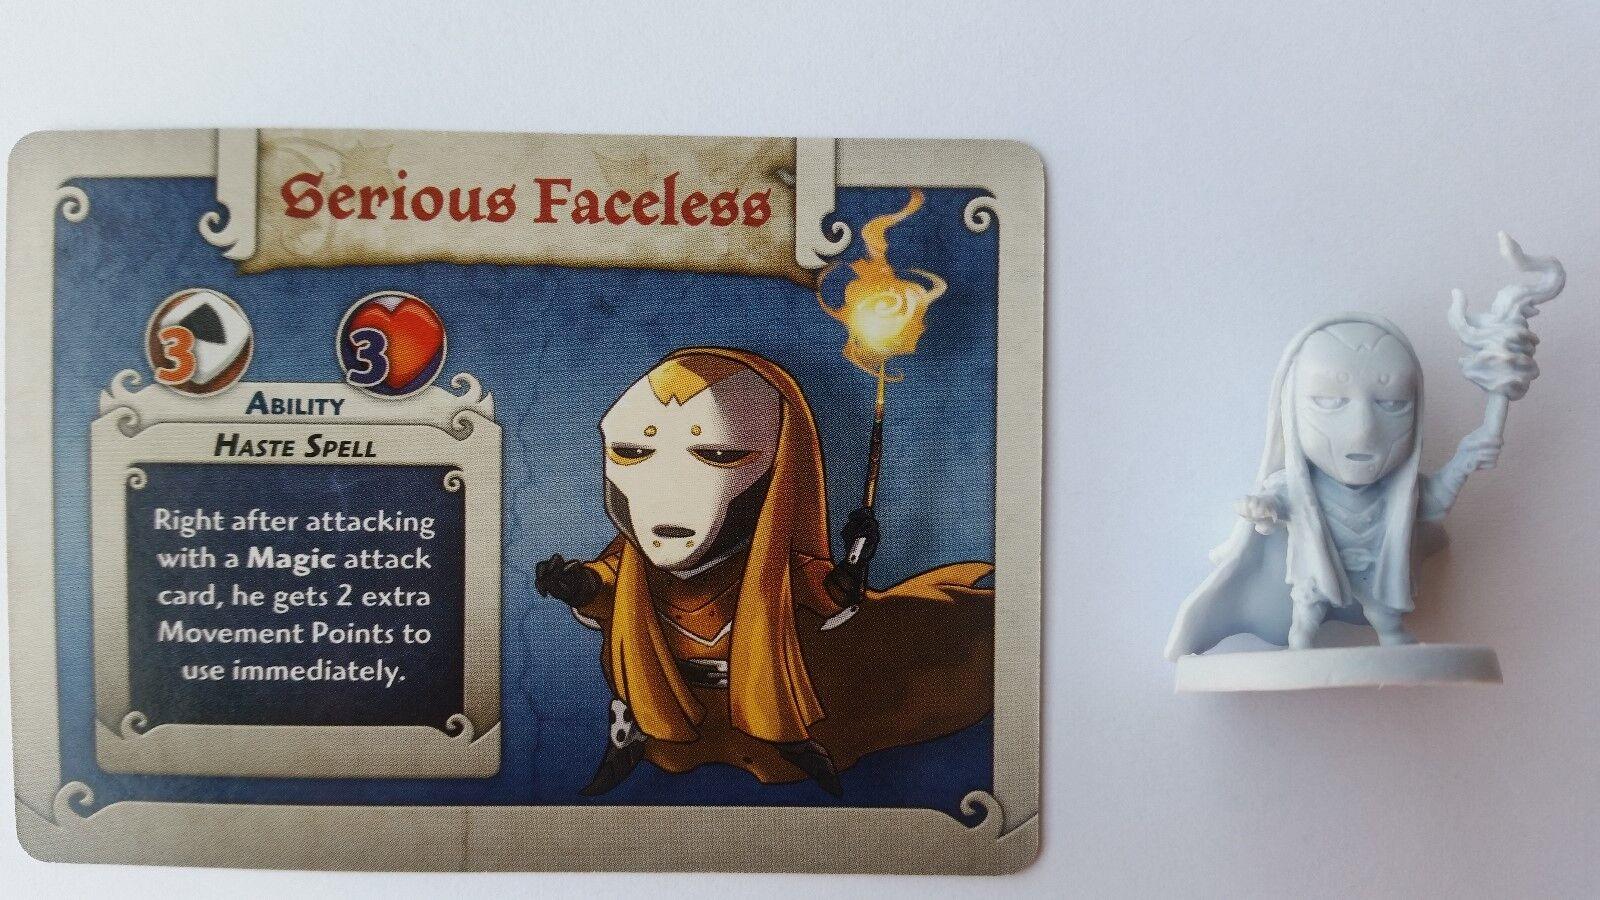 Arcadia quest promo serius Faceless, very difficult to get